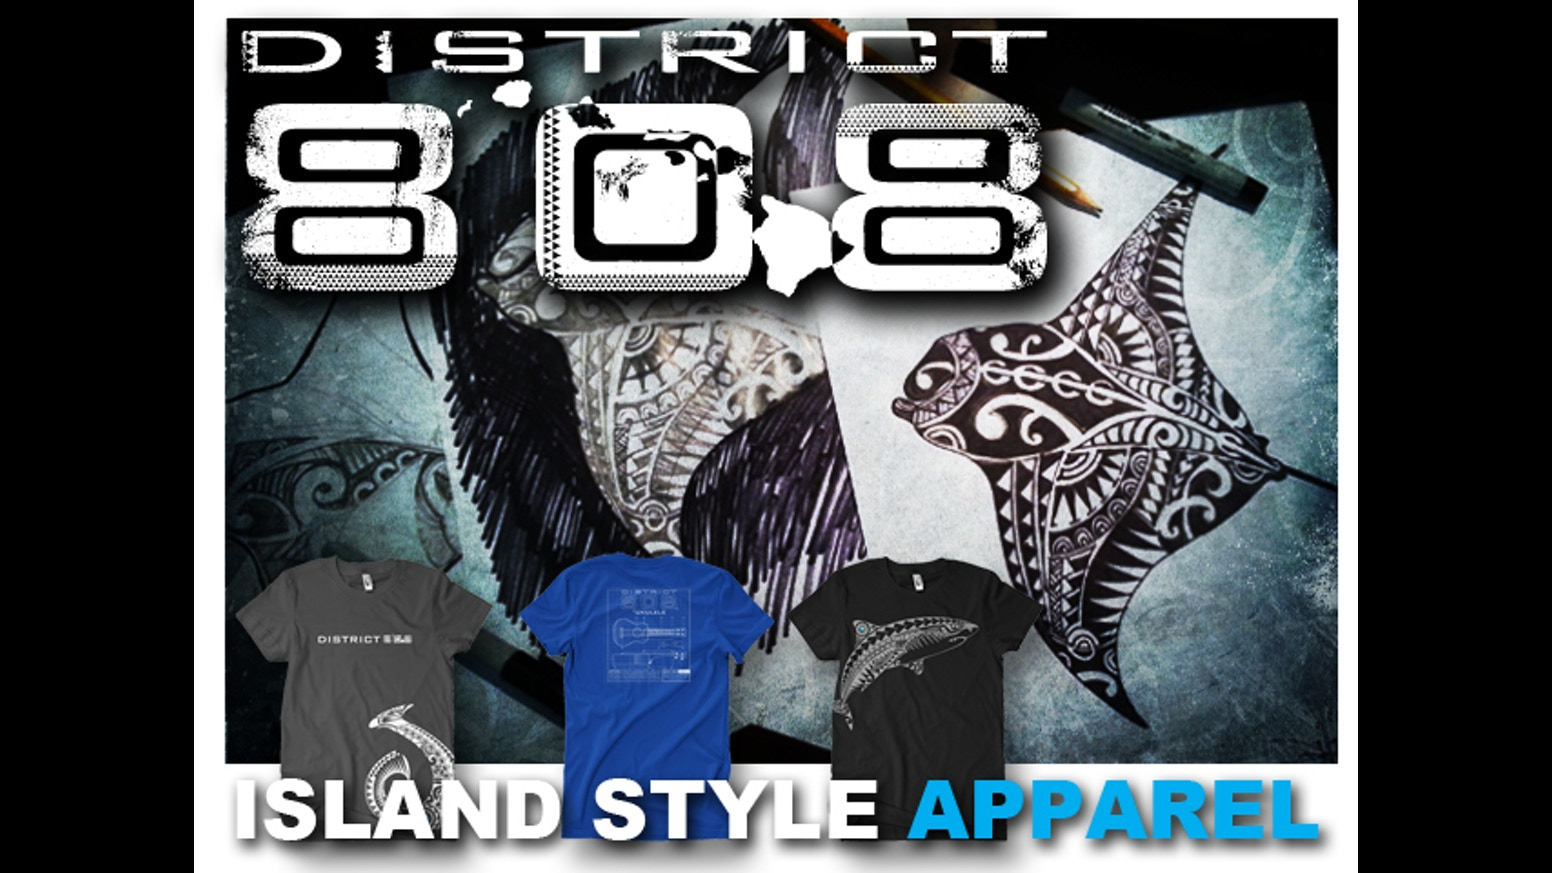 T shirt design hawaii - District 808 Hawaii Hawaiian Inspired T Shirt Designs